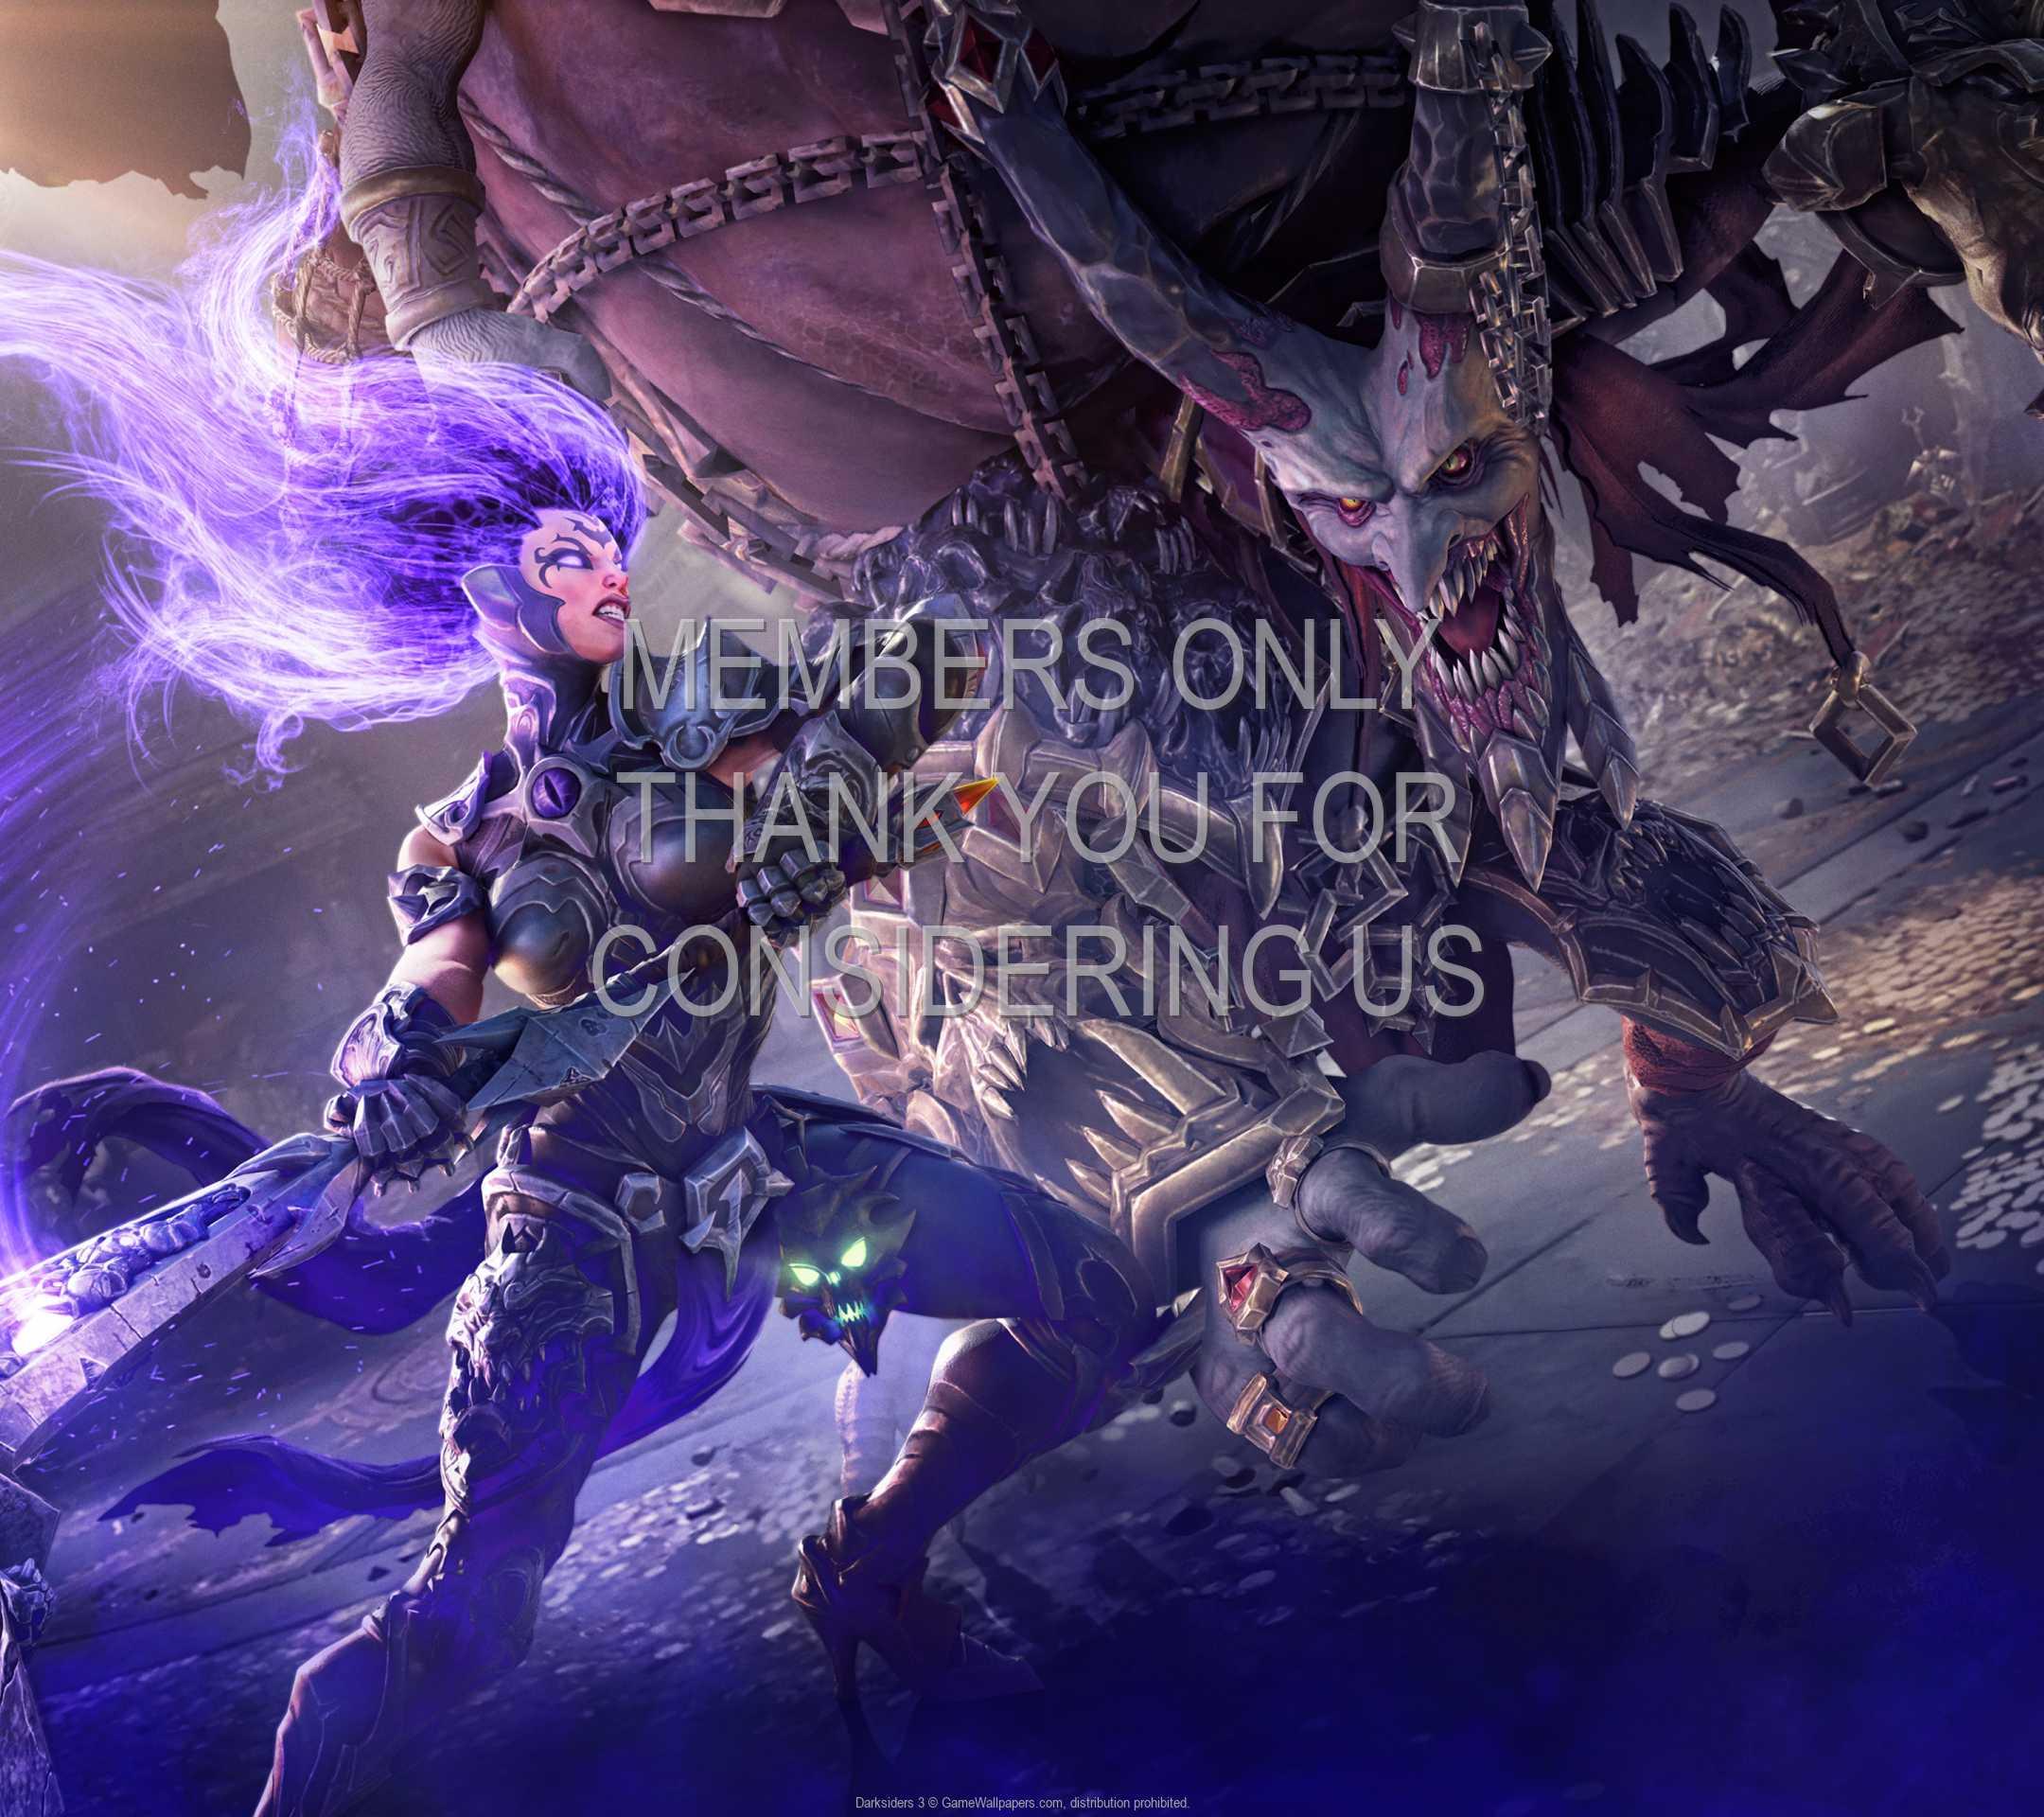 Darksiders 3 1080p Horizontal Mobile wallpaper or background 02